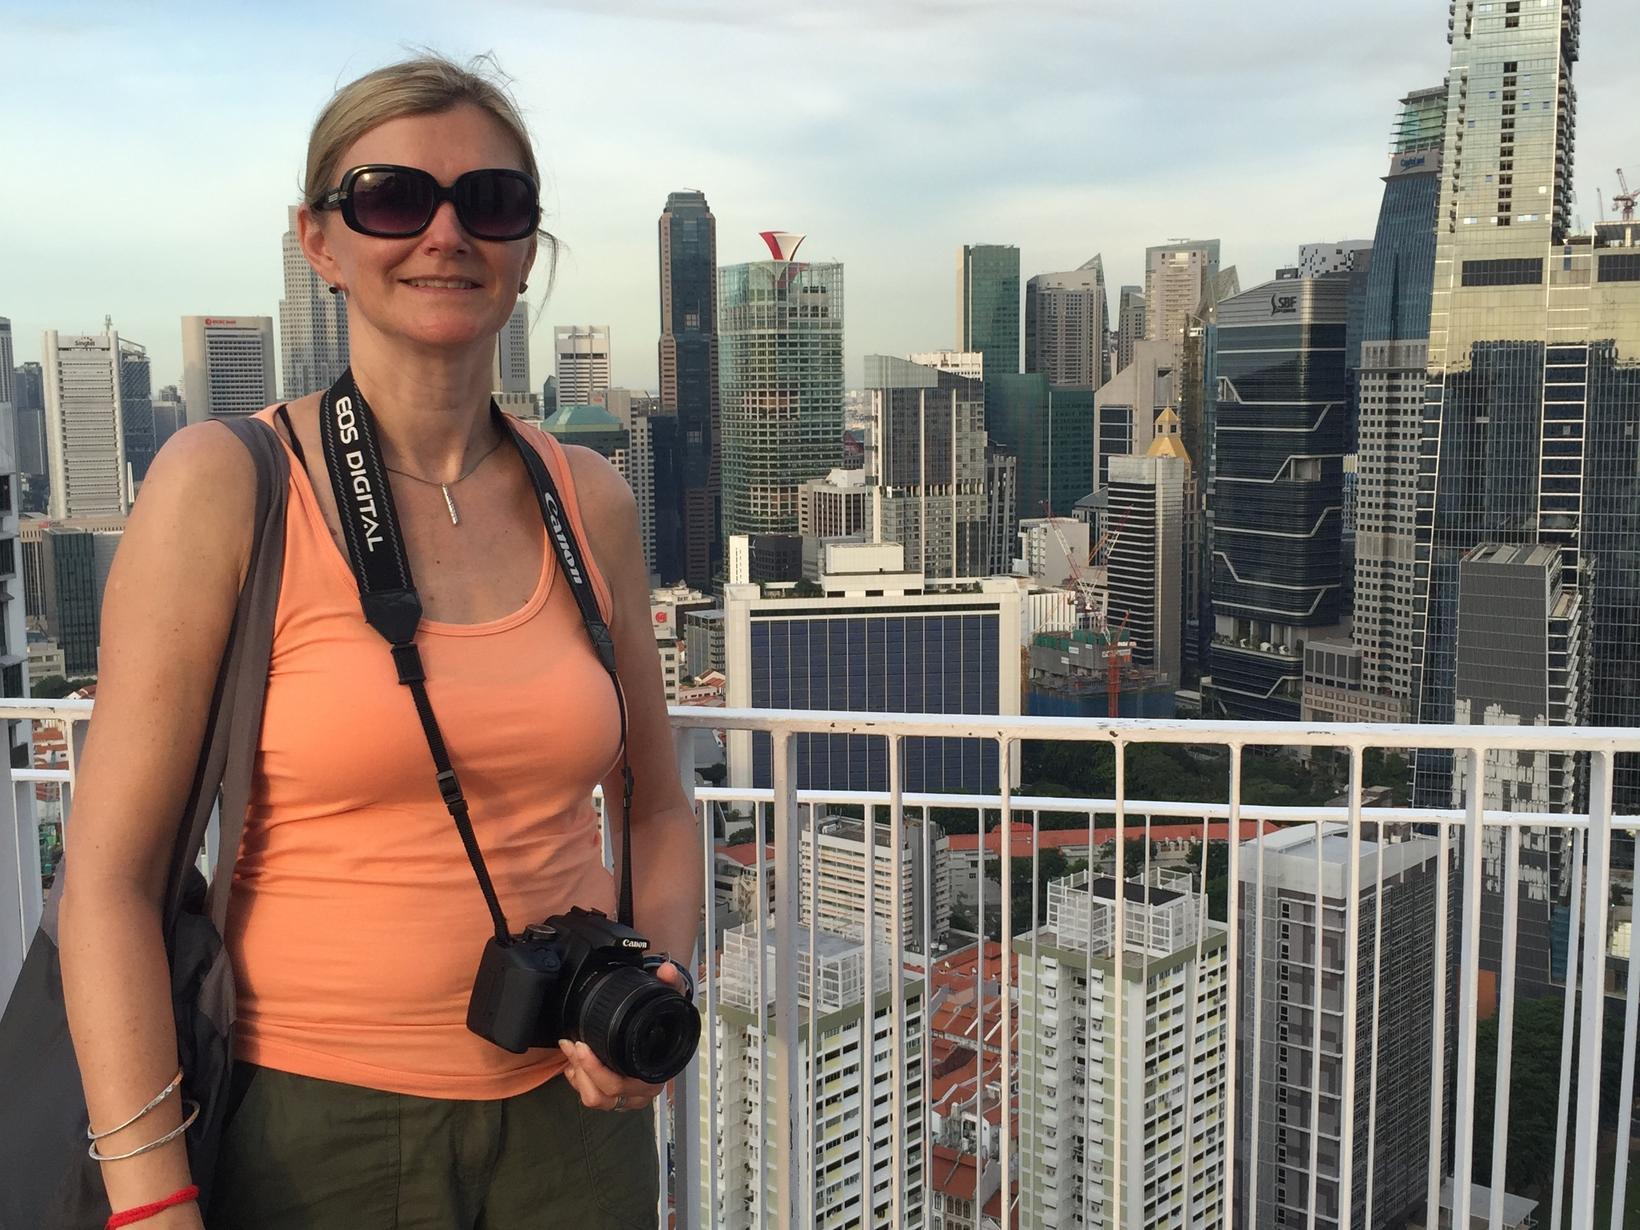 Deborah from Vancouver, British Columbia, Canada